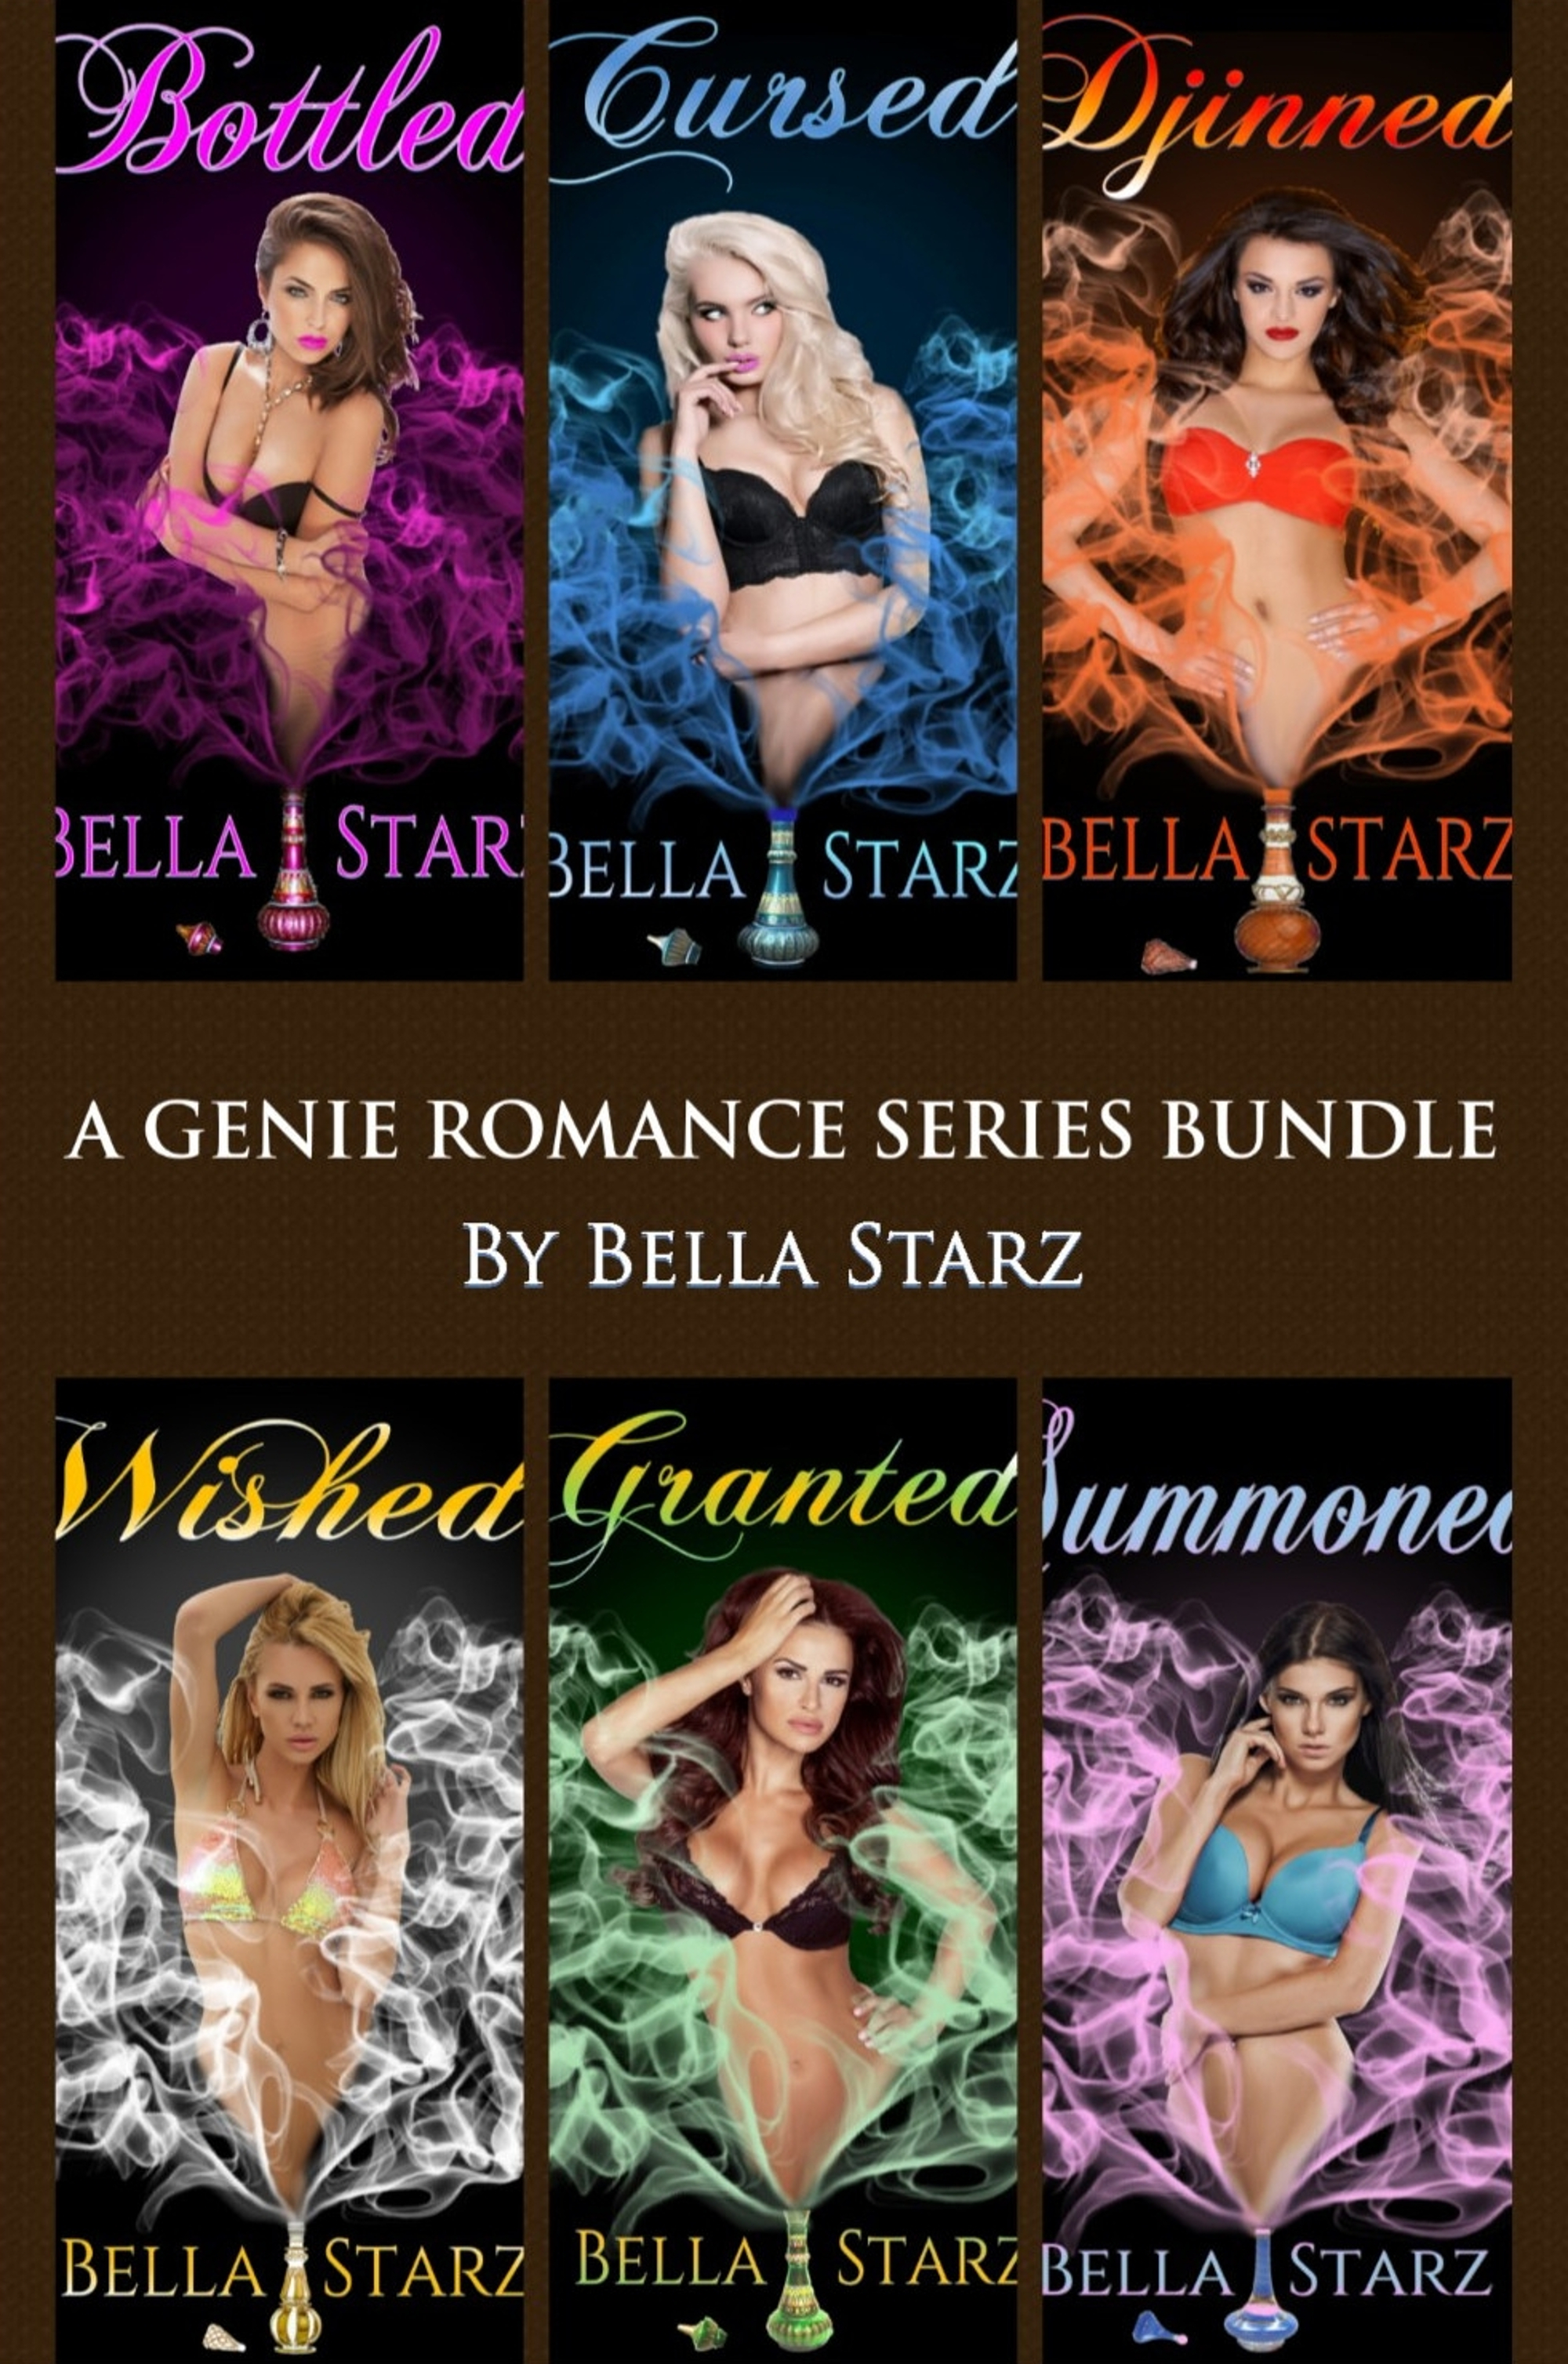 A Genie Romance Series Bundle